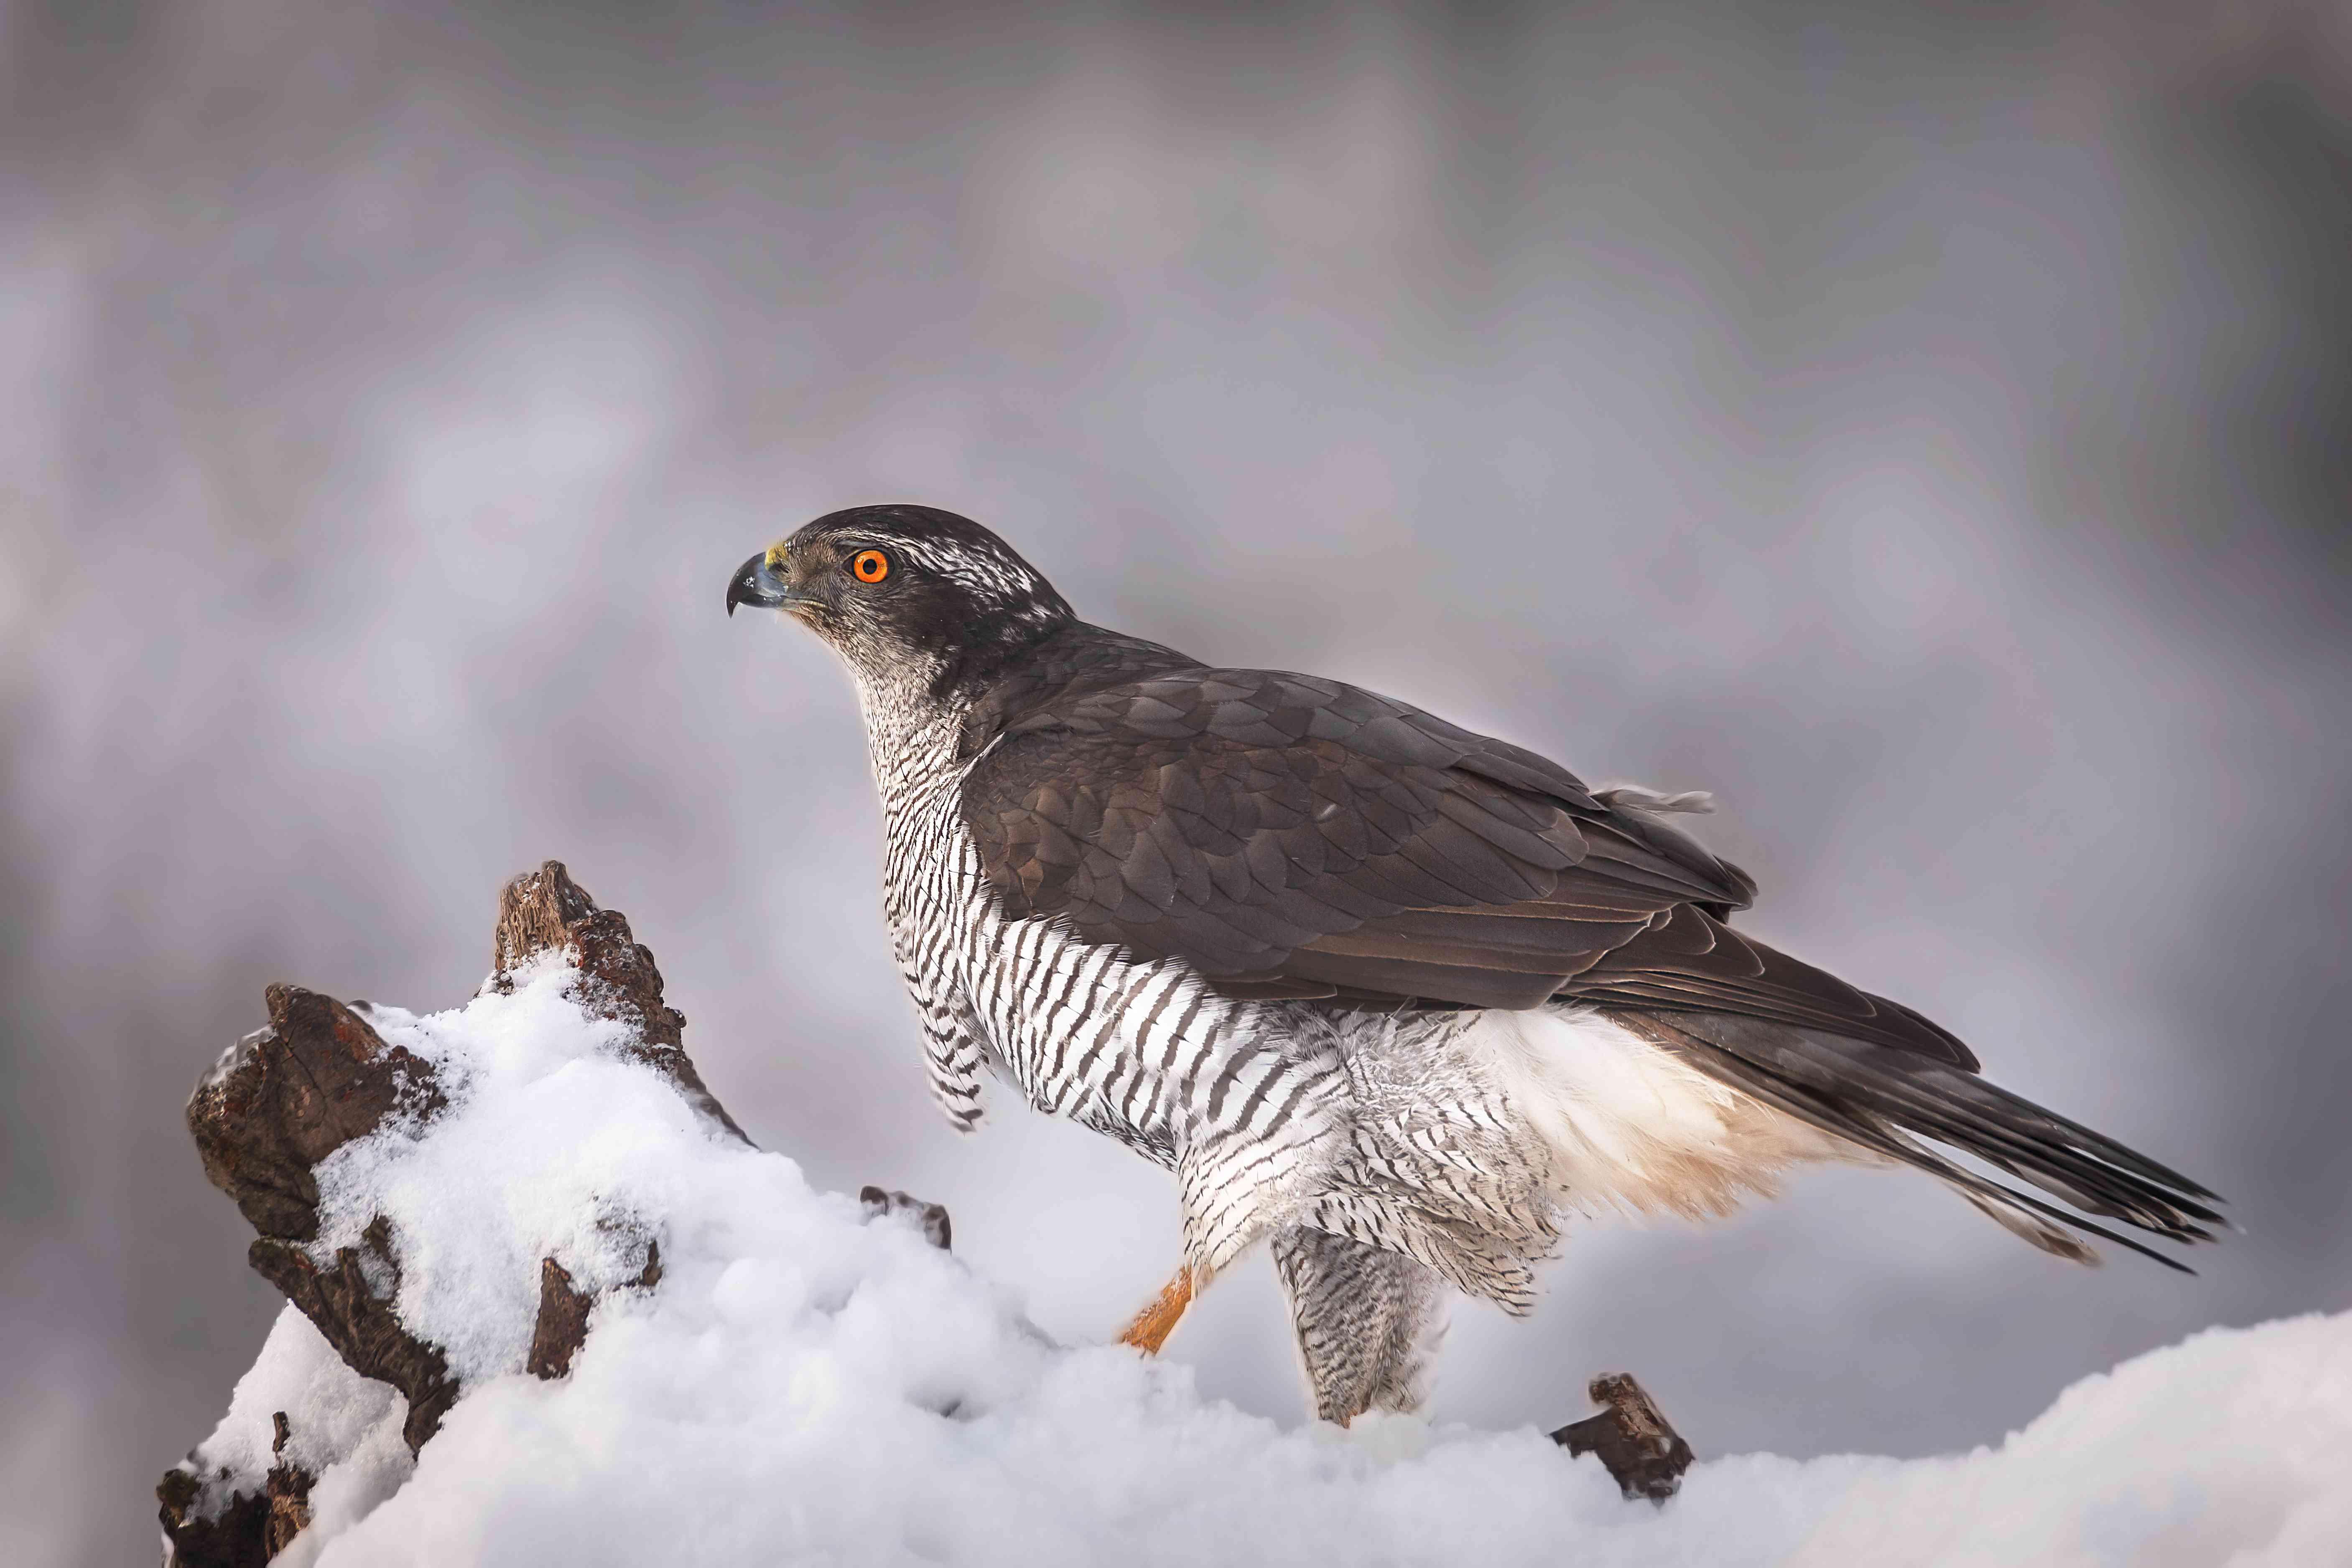 Close-up of northern goshawk of prey perching on snow,Poland